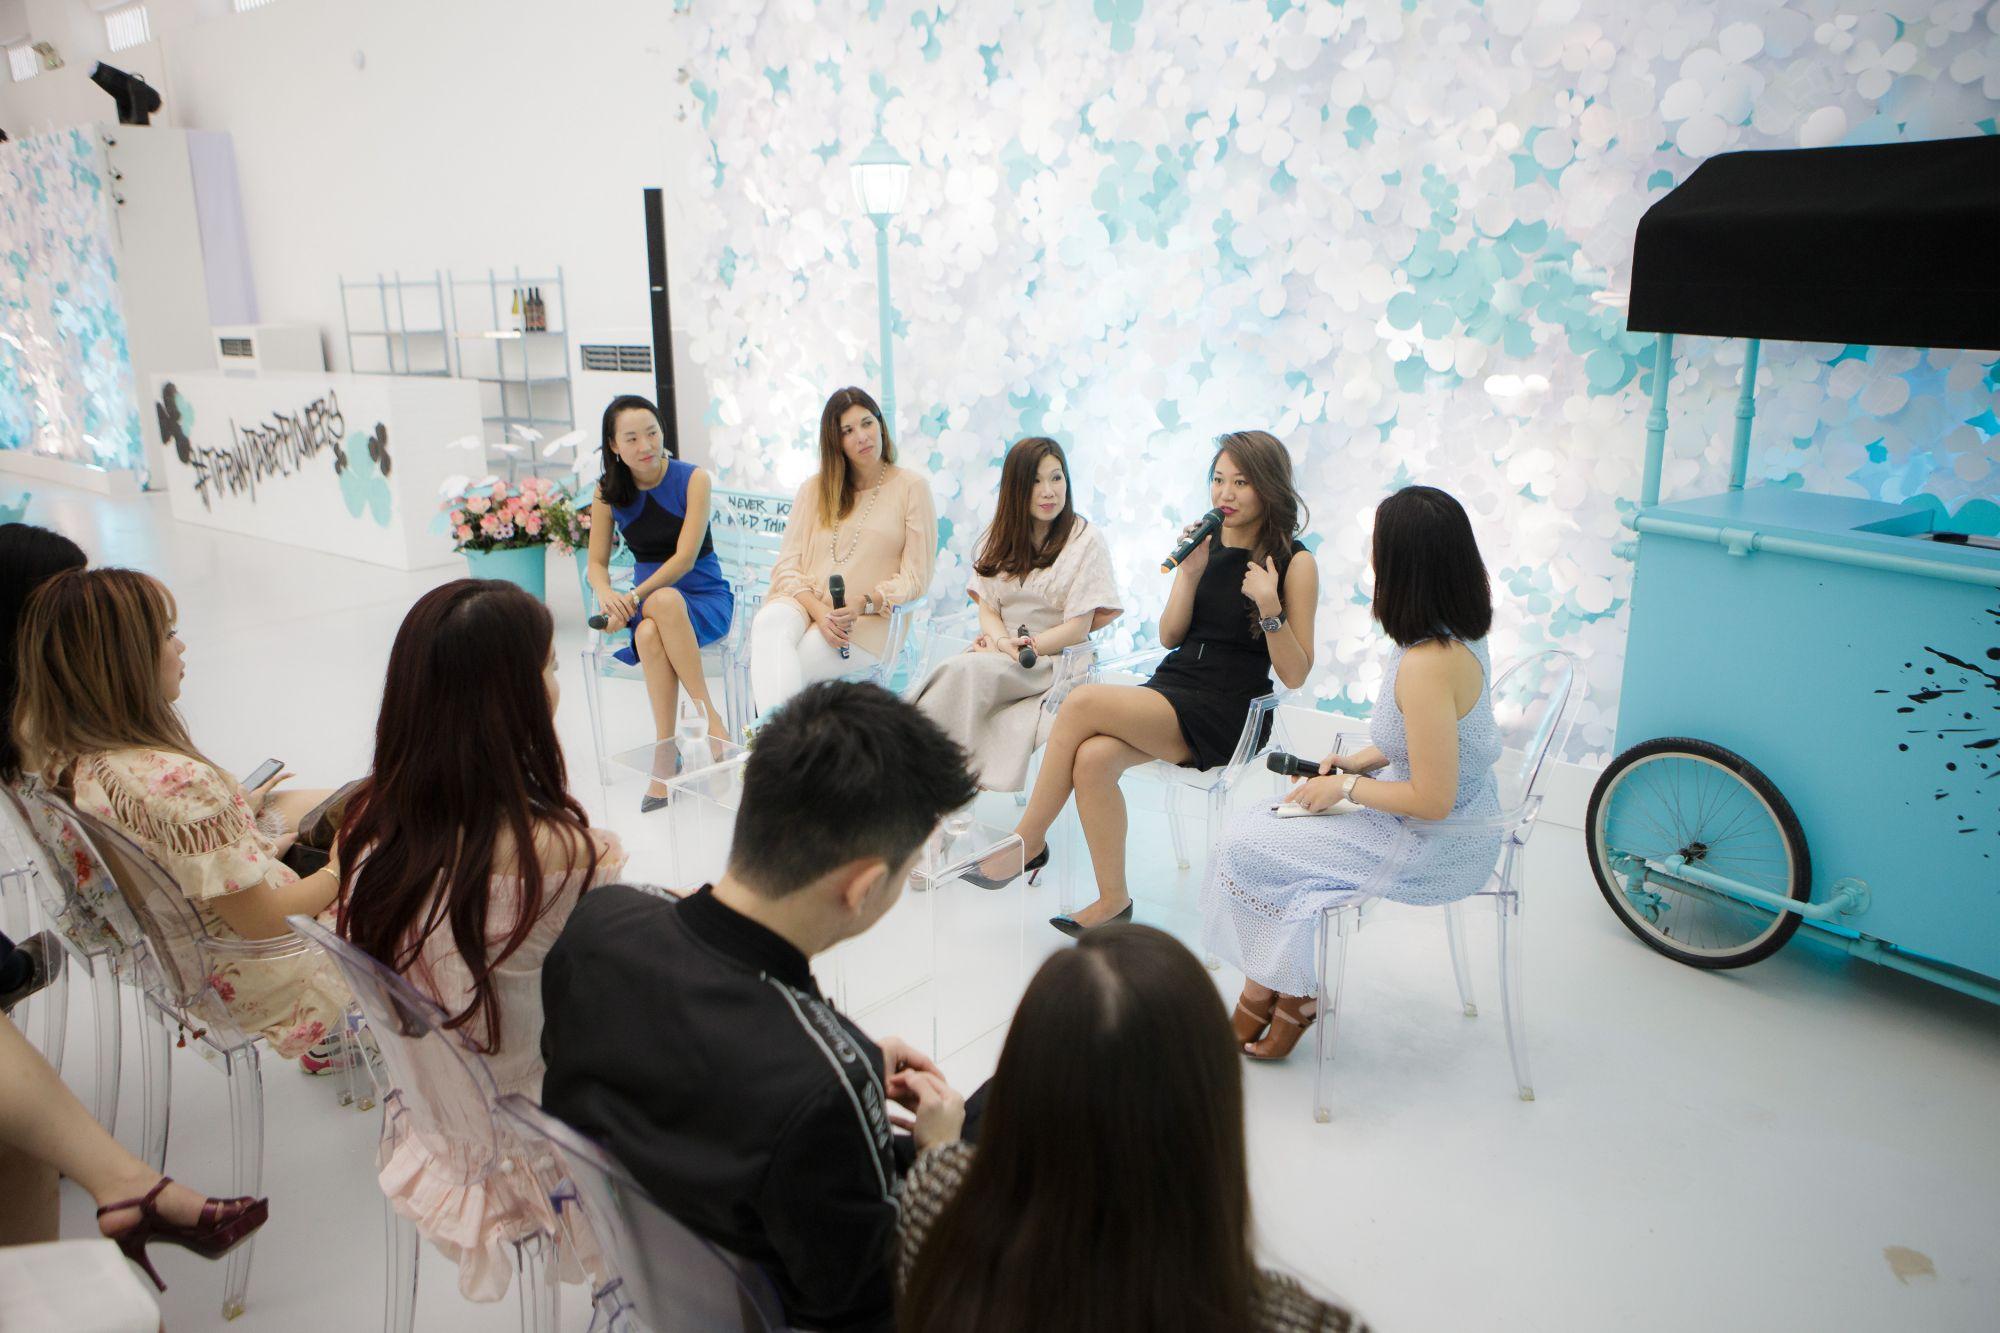 Juliana Chan, Sonja Prokopec, Susan Peh, Anna Haotanto, Kissa Castañeda